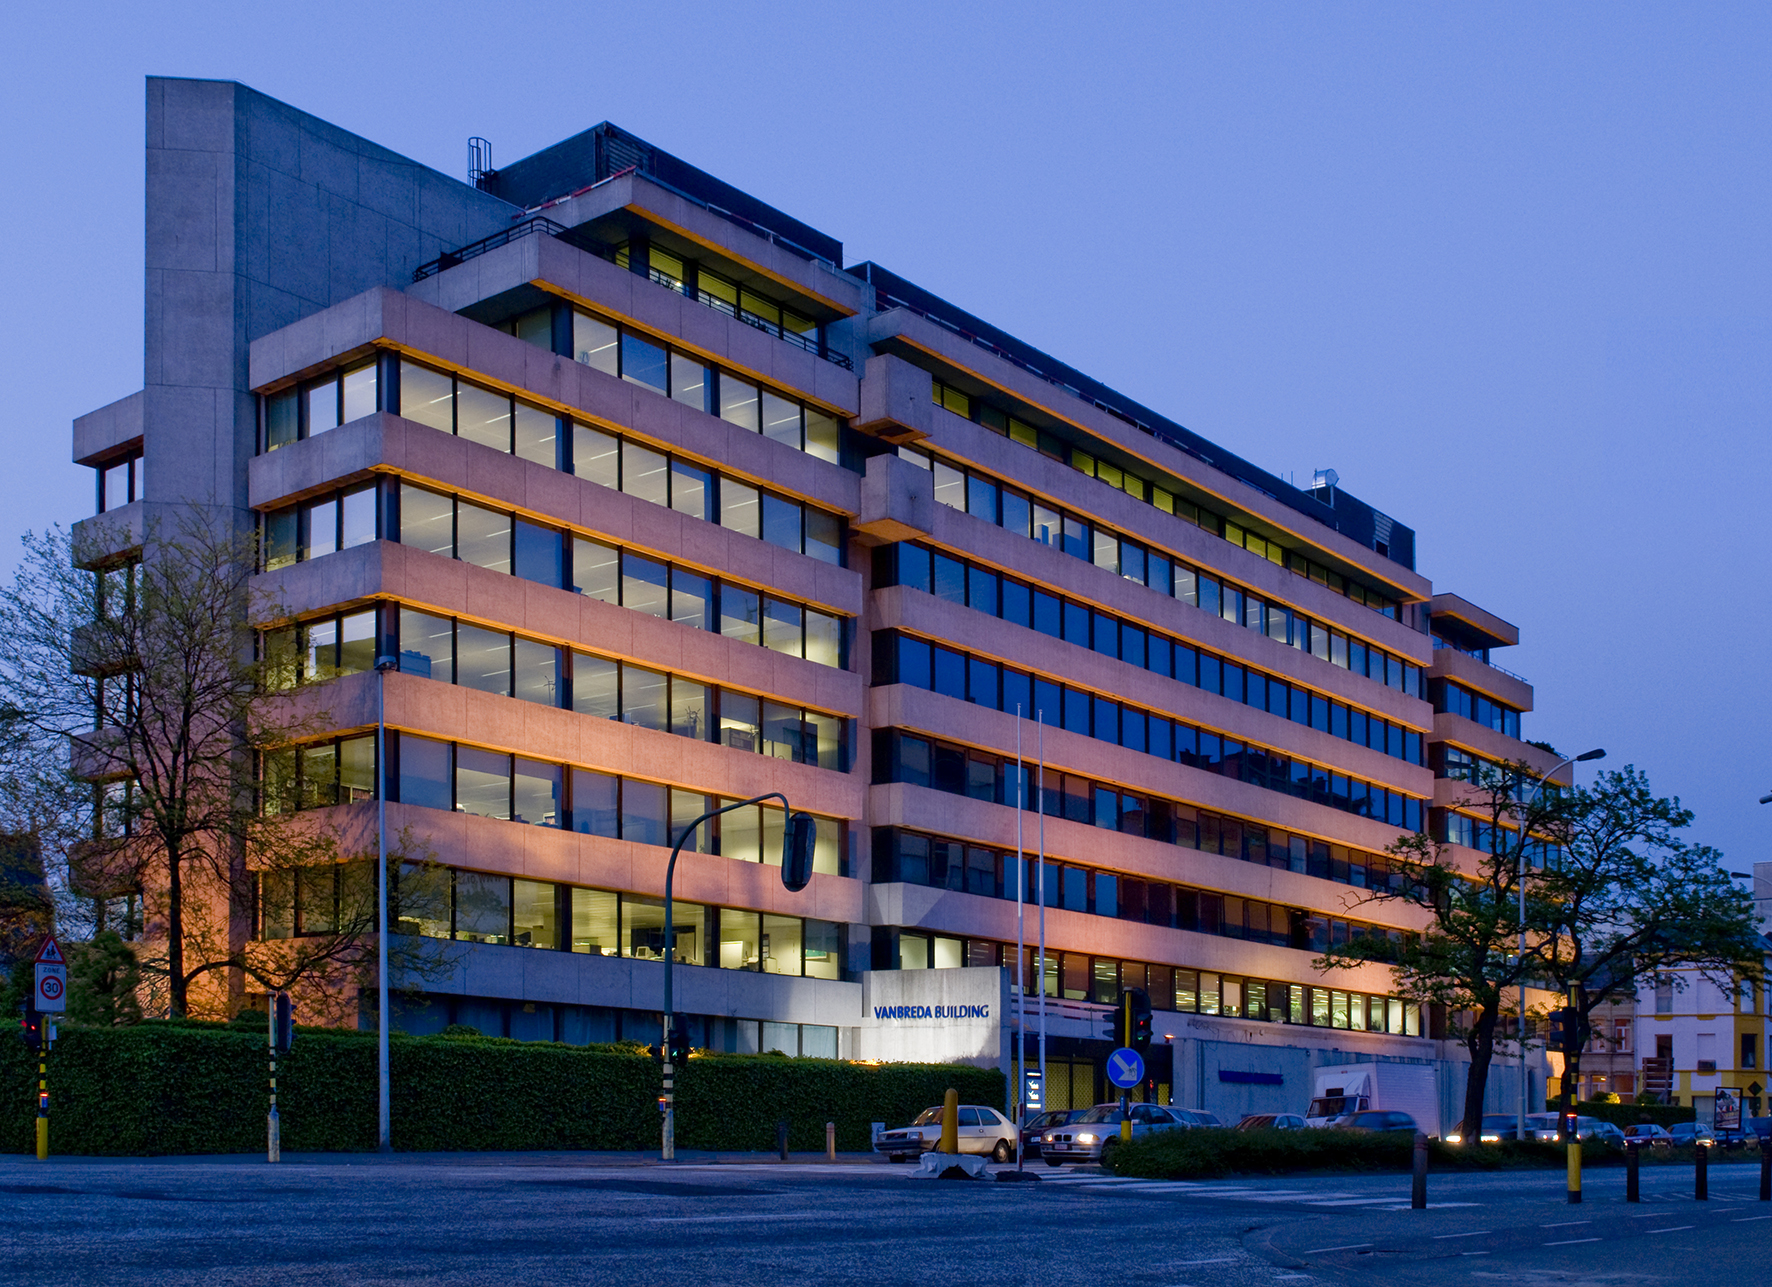 Vanbreda Groep doet overnames in België en Nederland